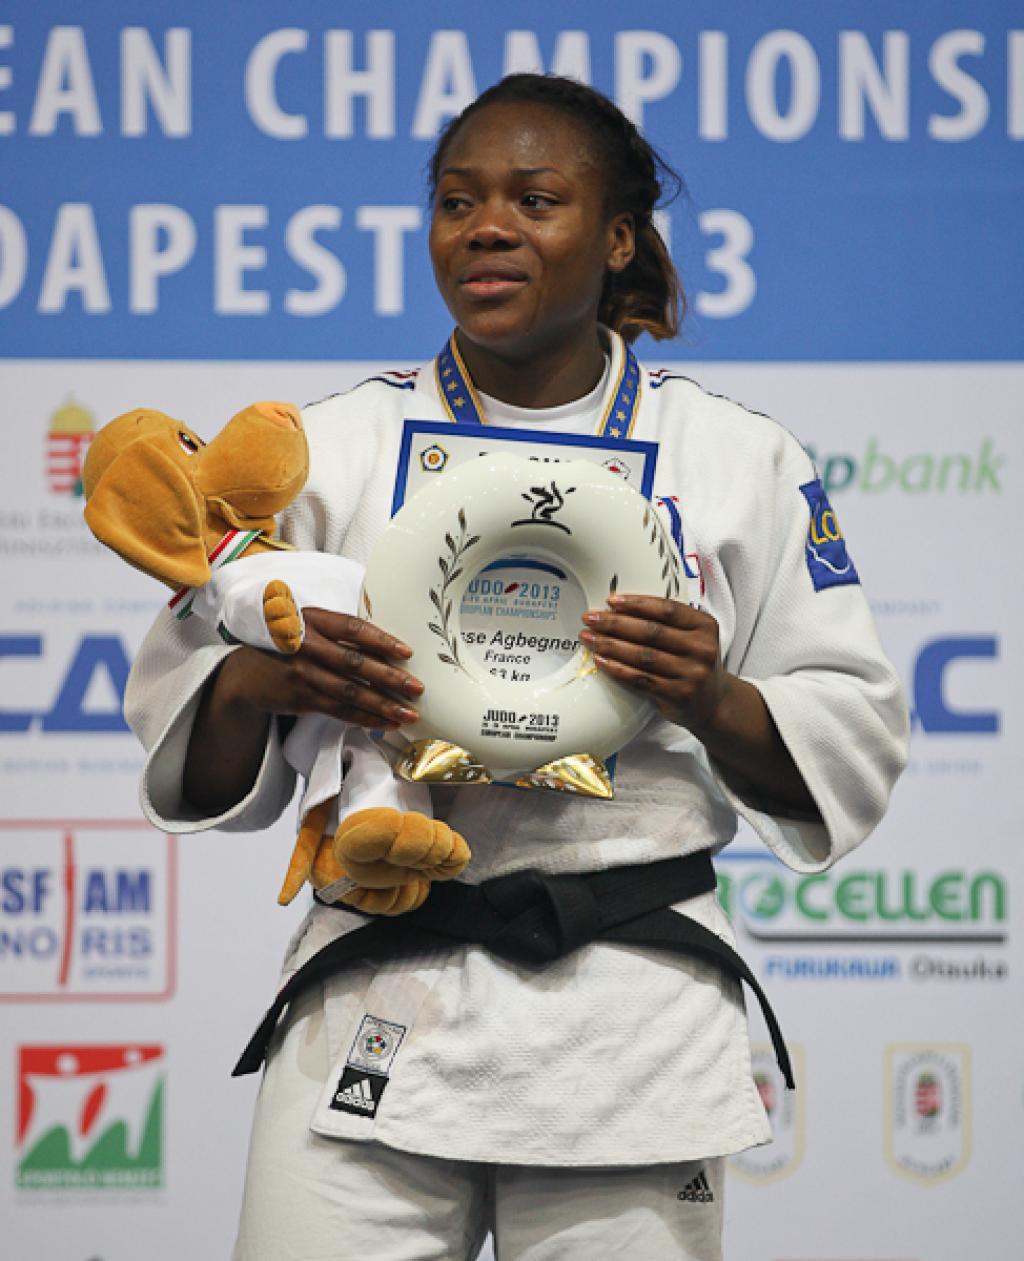 Agbegnenou adds European title to successful 2013